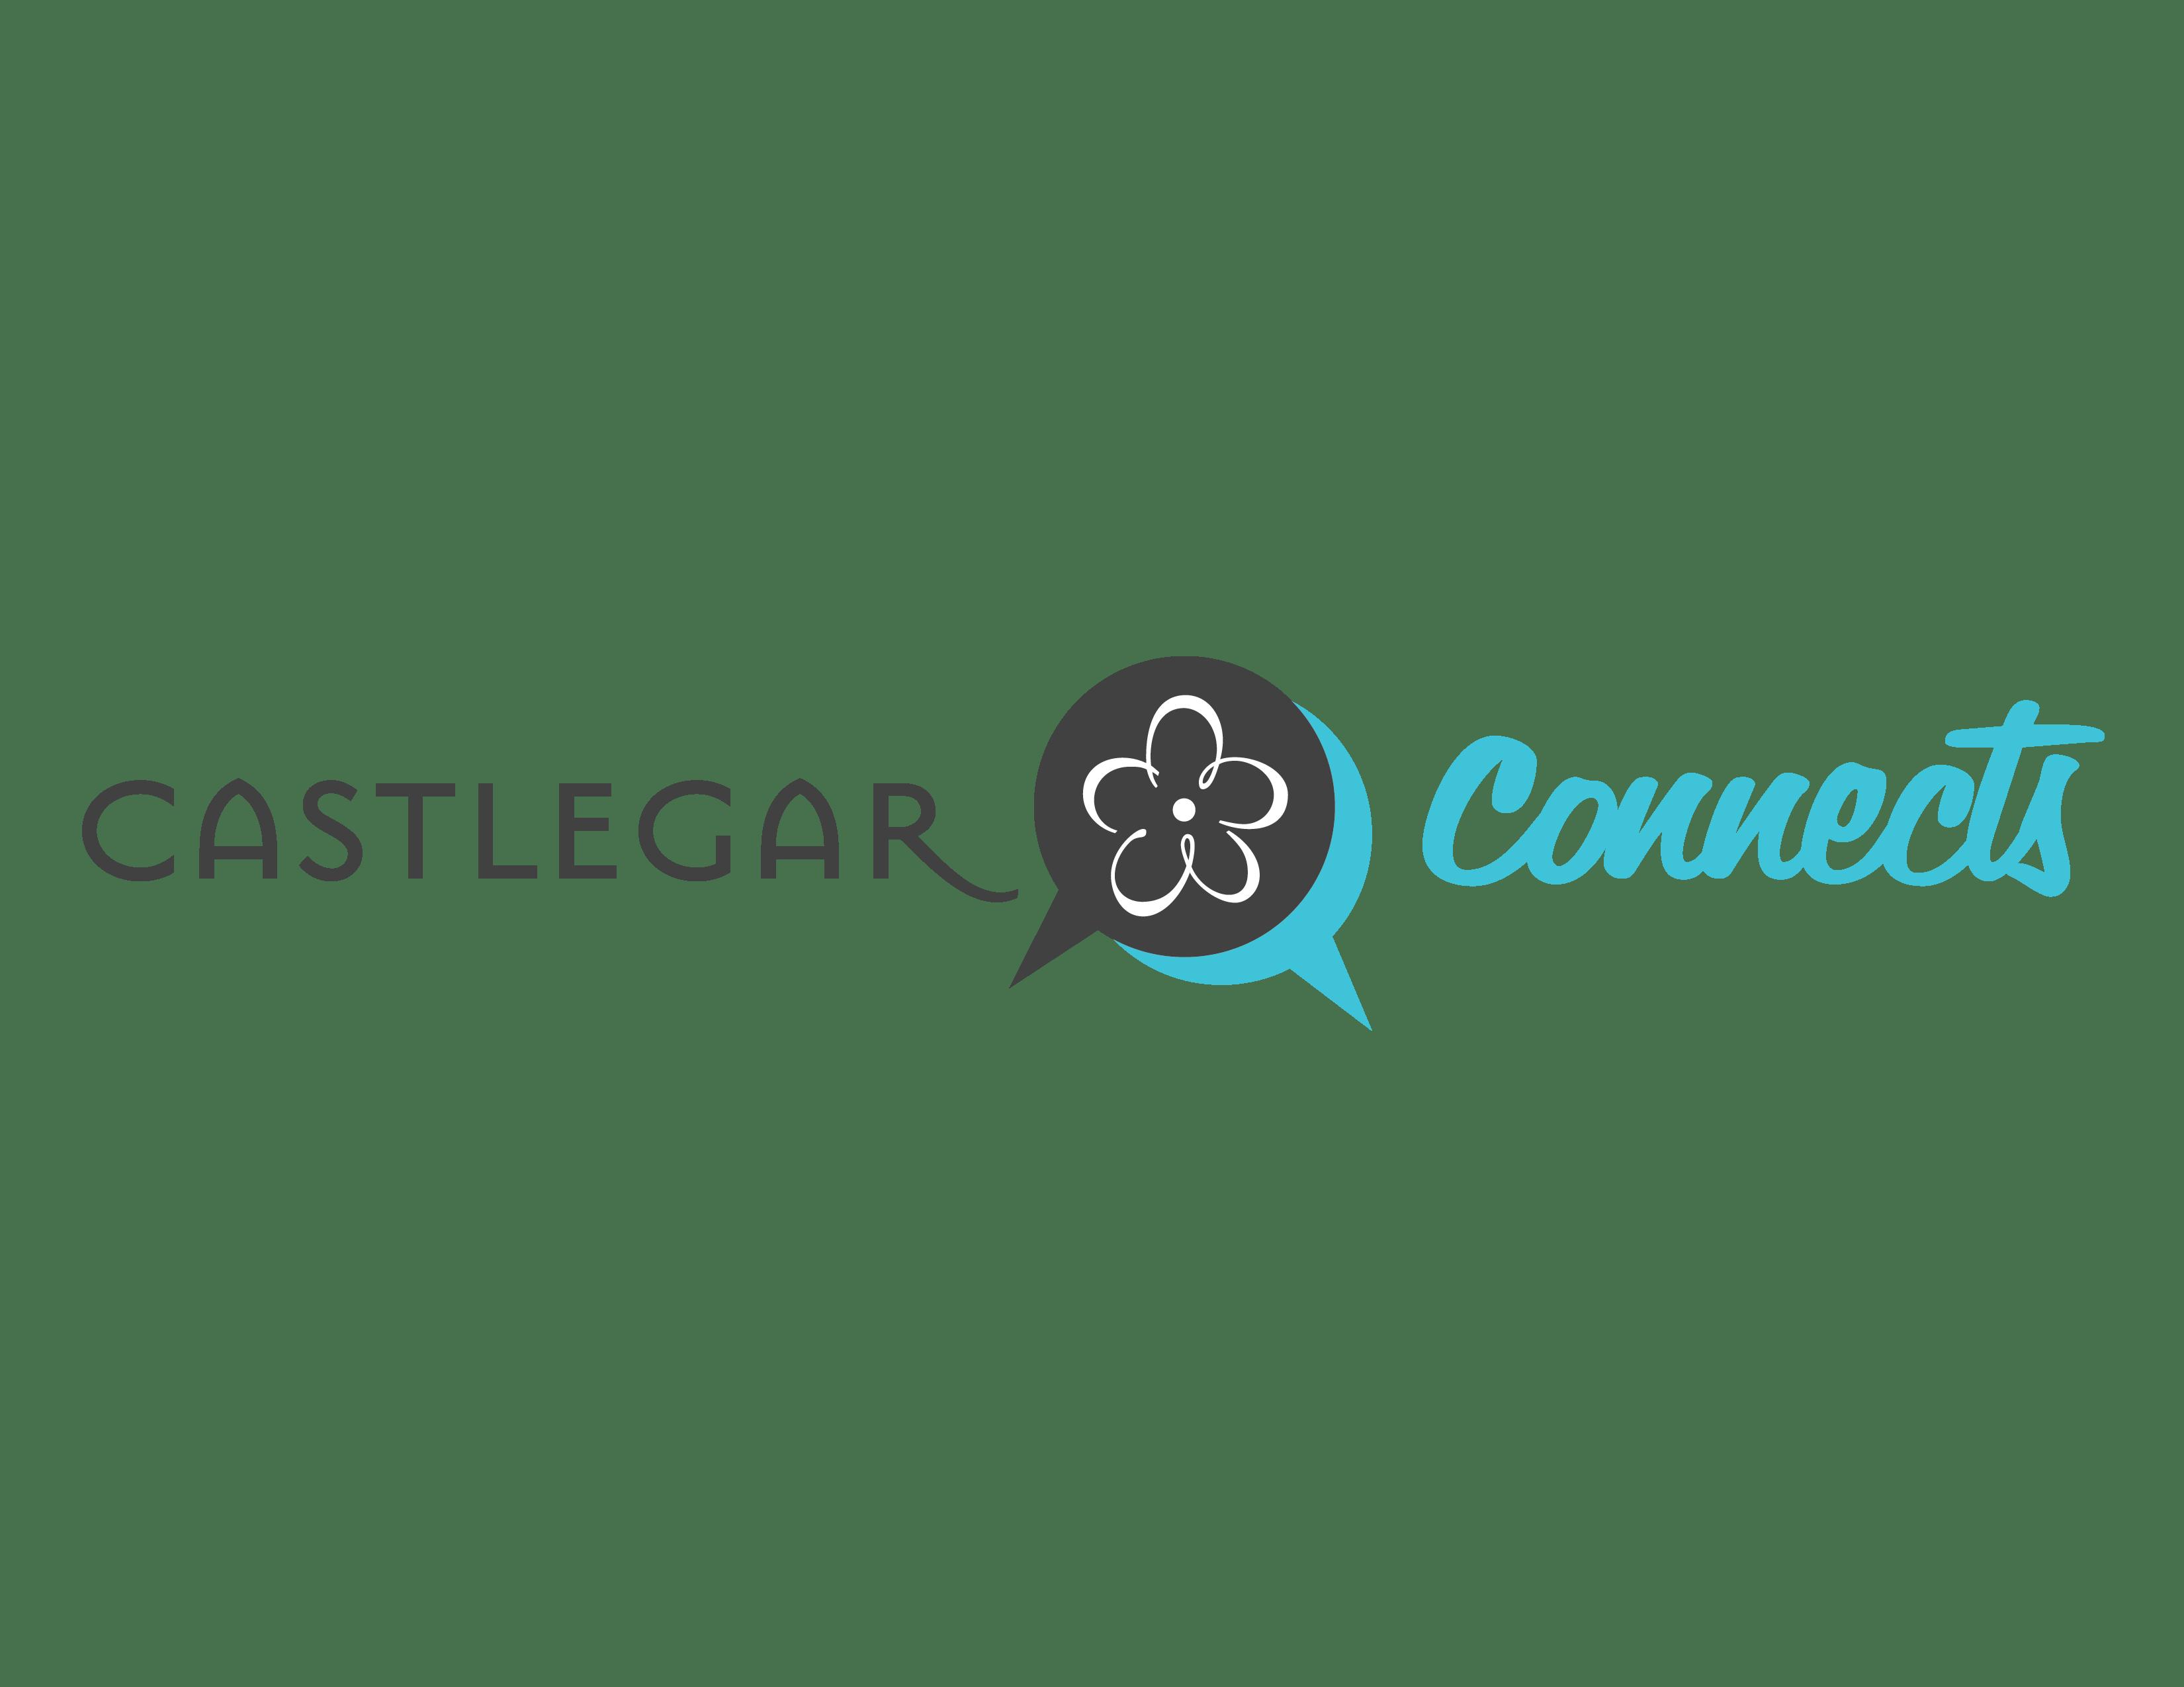 Castlegar Connects